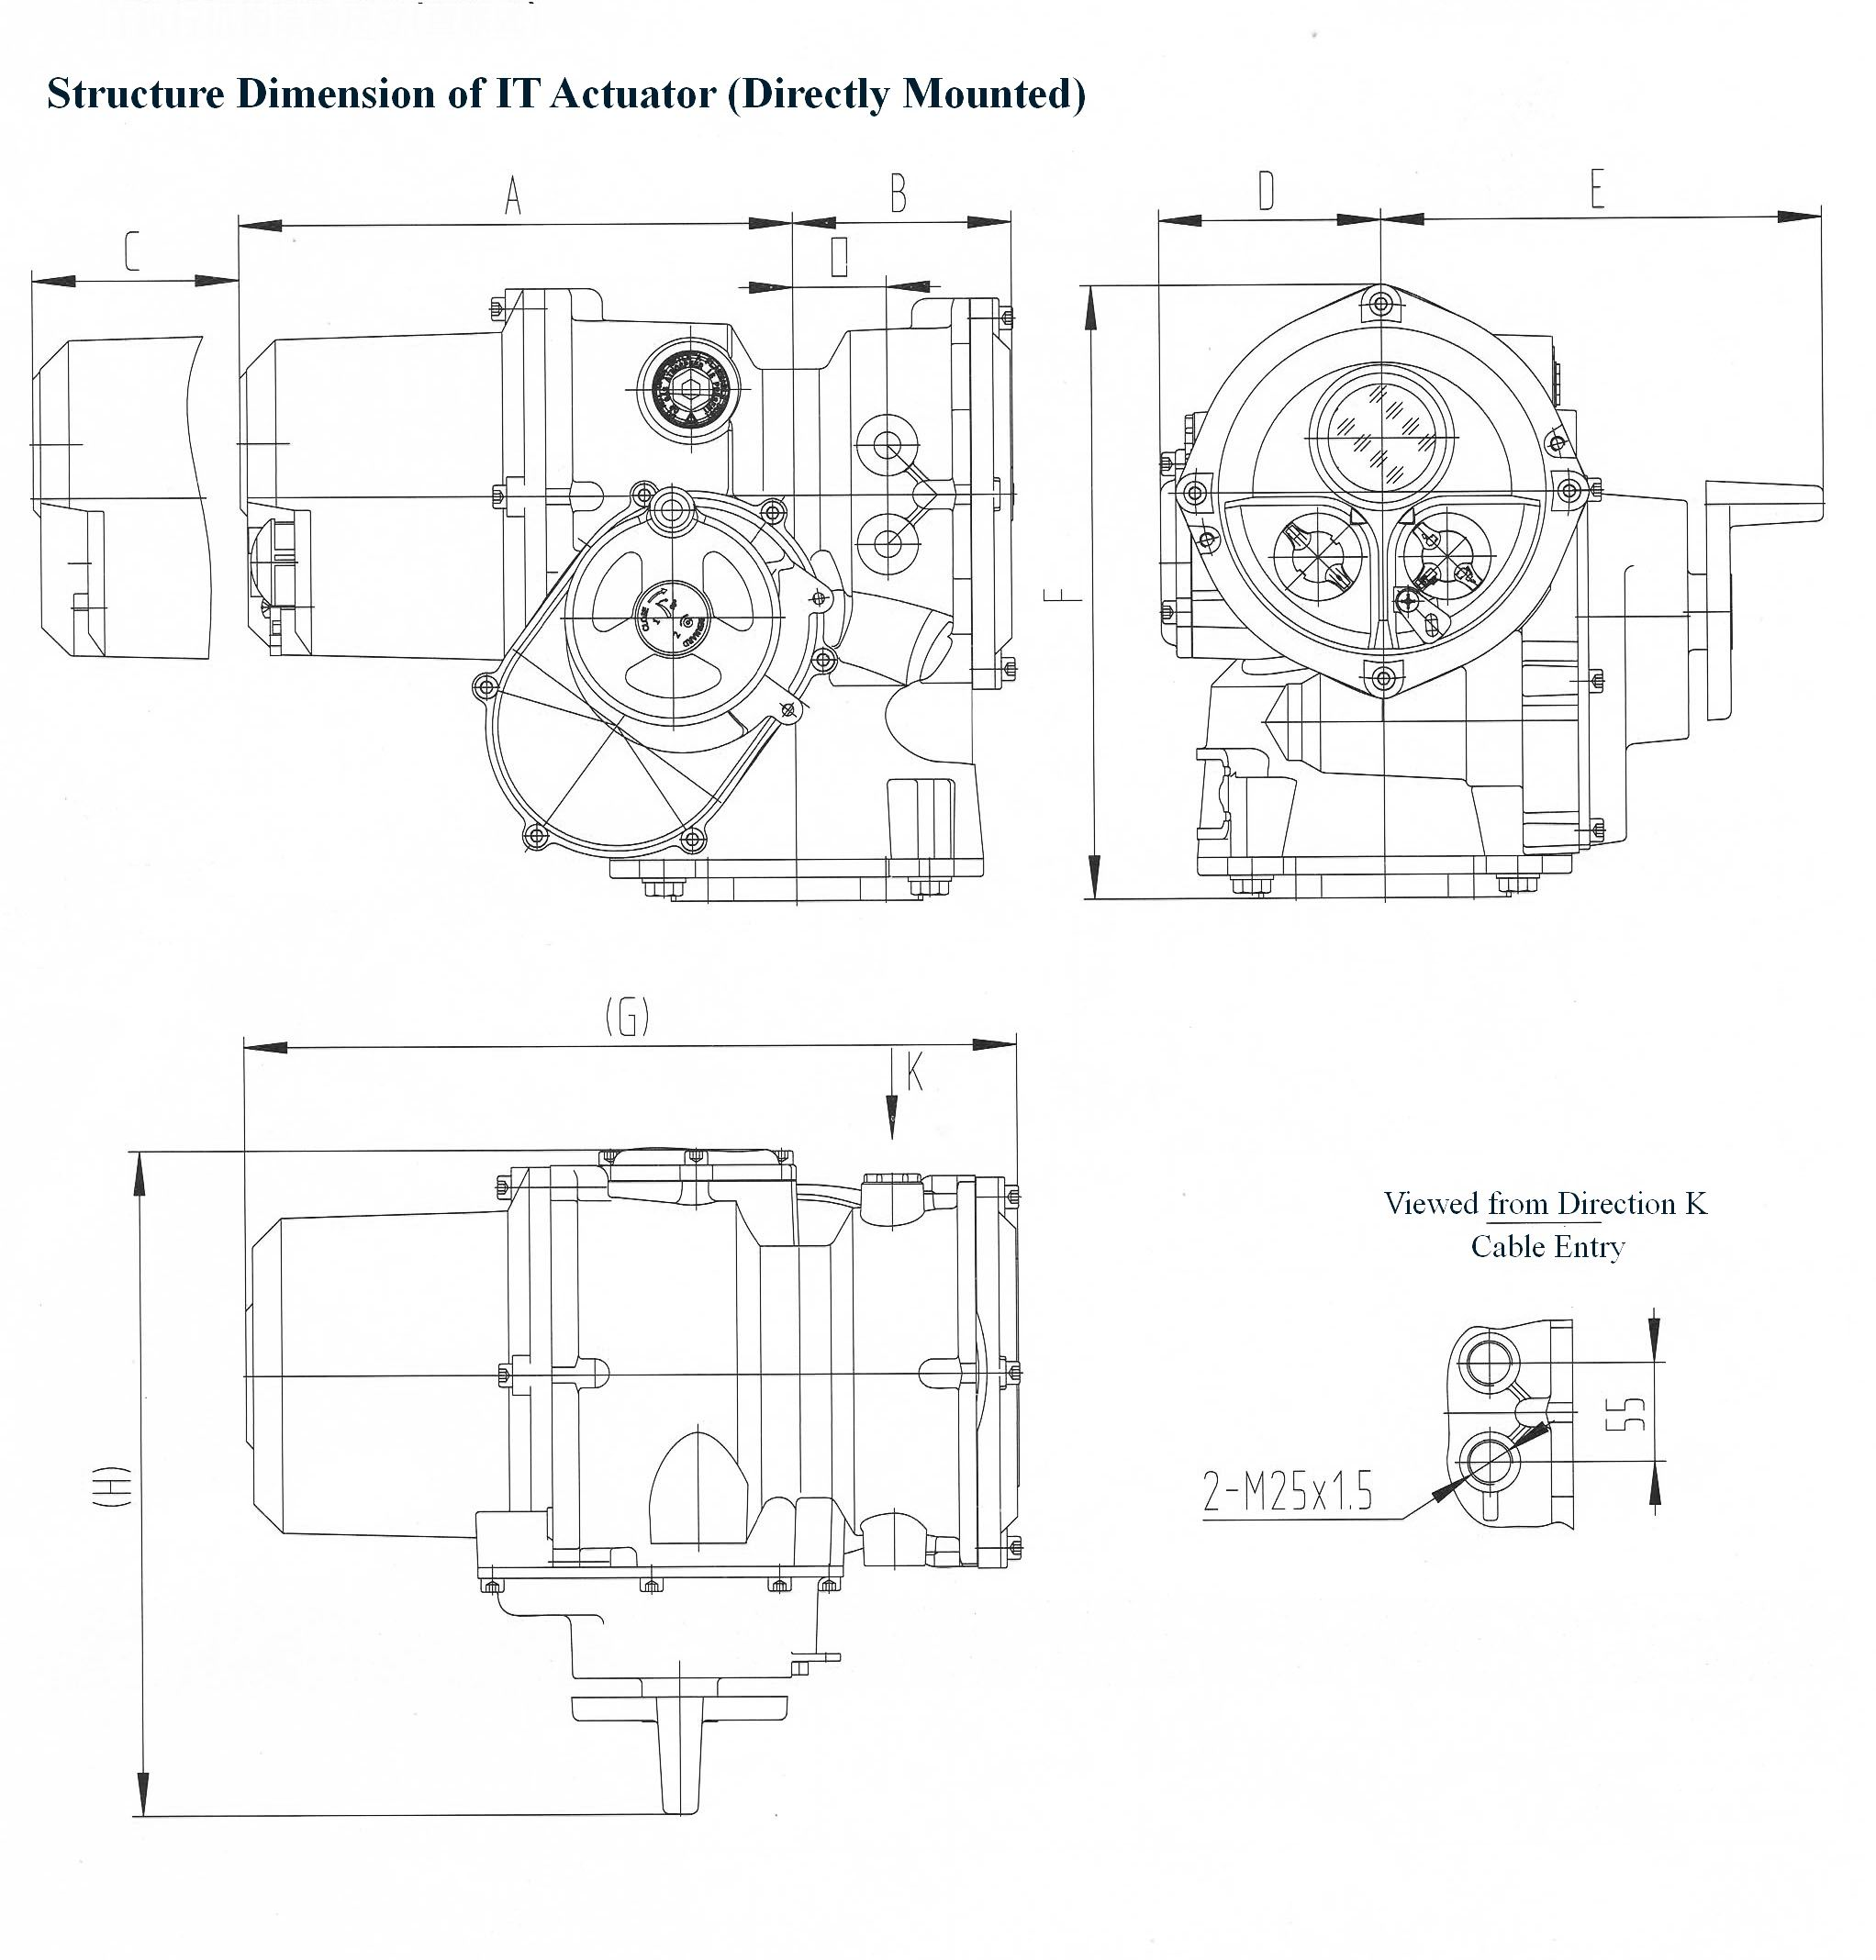 Bernard Actuator Wiring Diagram Beginners Auma Valve Actuators Electric Motorized Control Diagrams